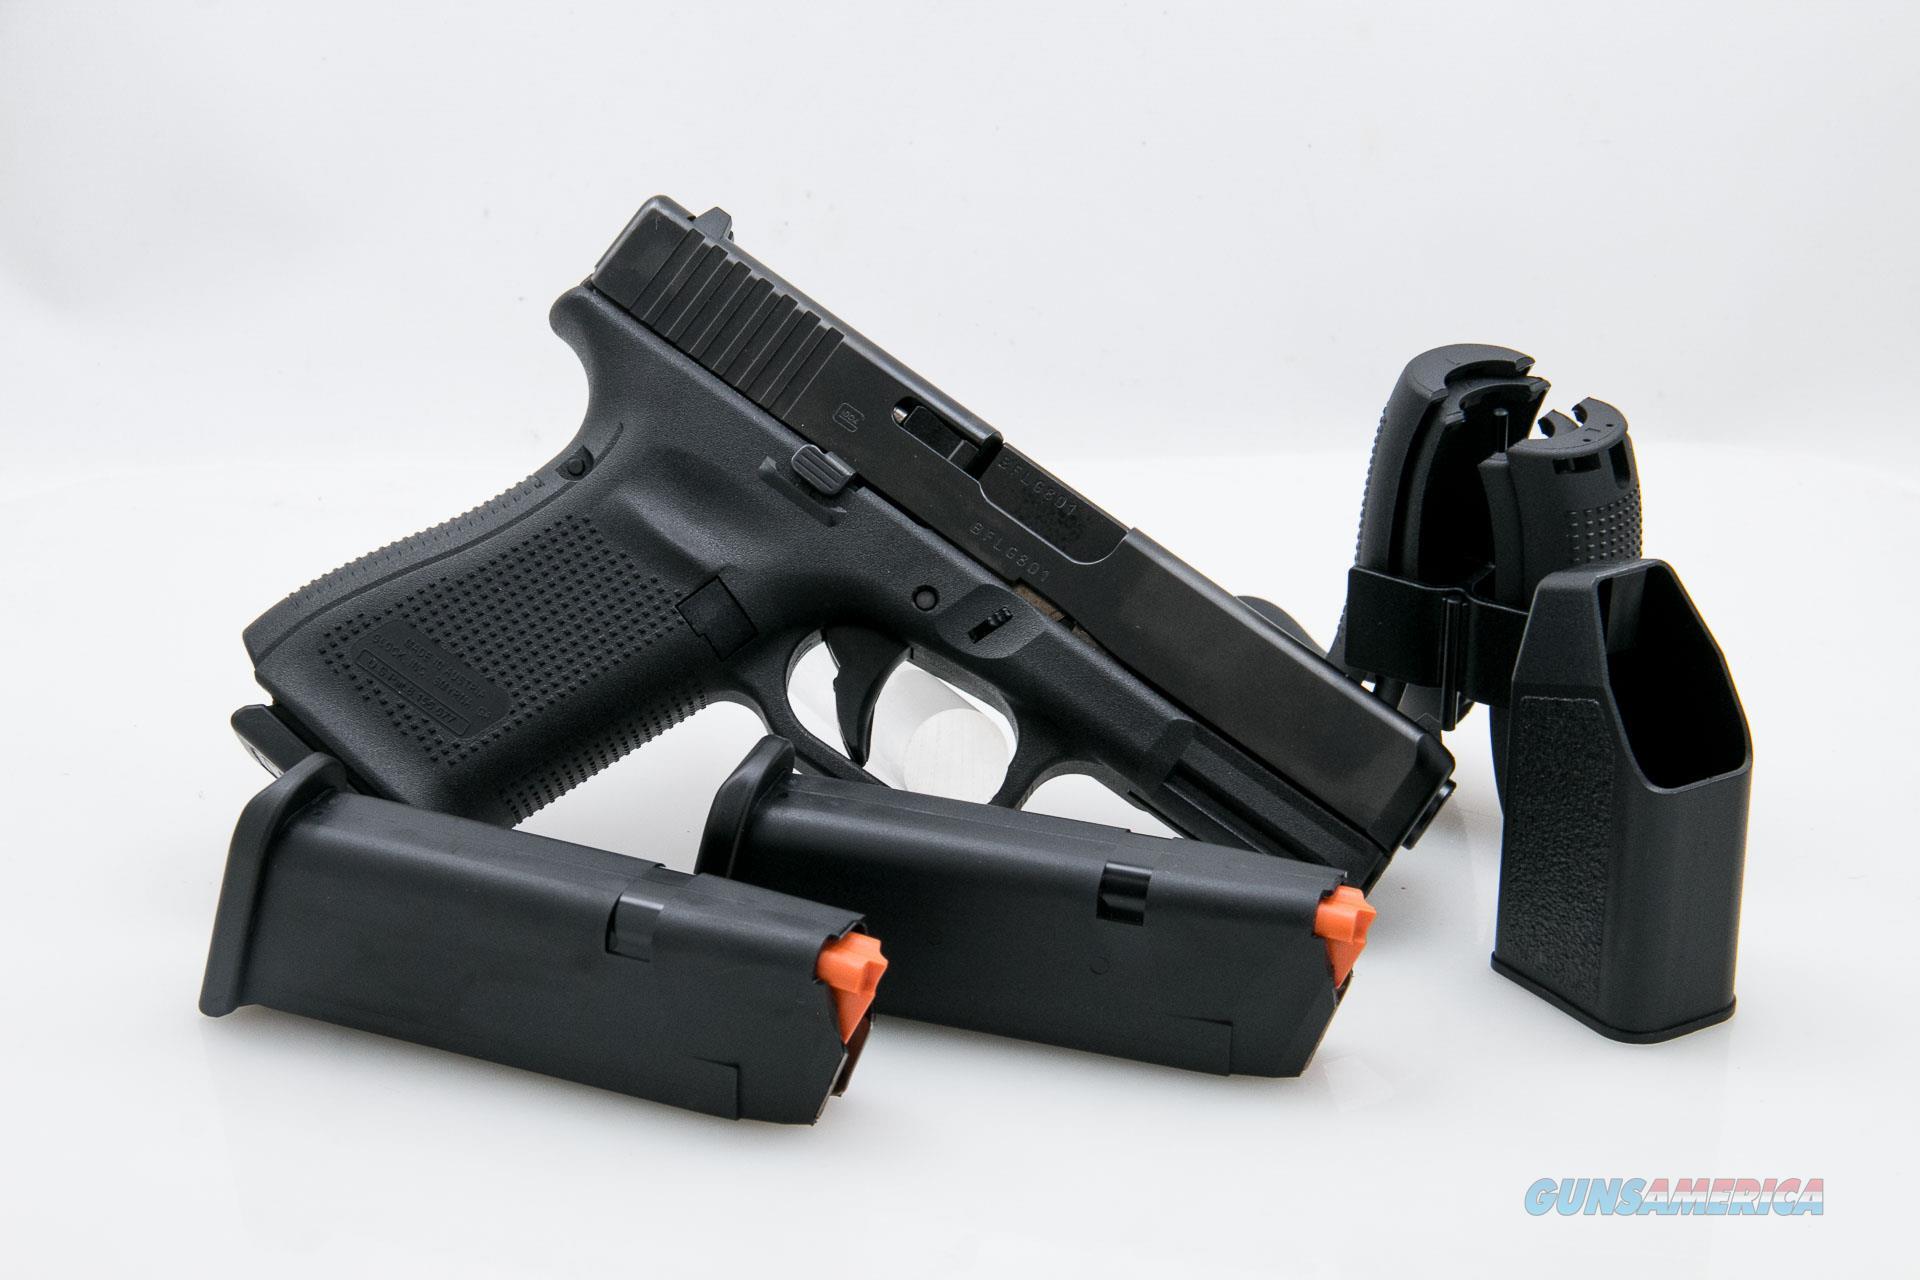 Glock 19 Generation 5 9mm NEW Three Magazines  Guns > Pistols > Glock Pistols > 19/19X